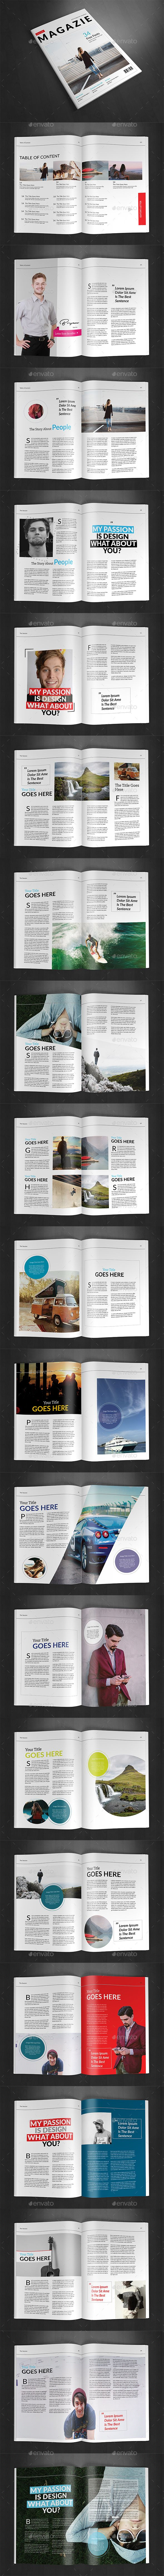 A4 Magazine Template Vol.21  — PSD Template #business magazine #a4 magazine • Download ➝ https://graphicriver.net/item/a4-magazine-template-vol21/18044682?ref=pxcr